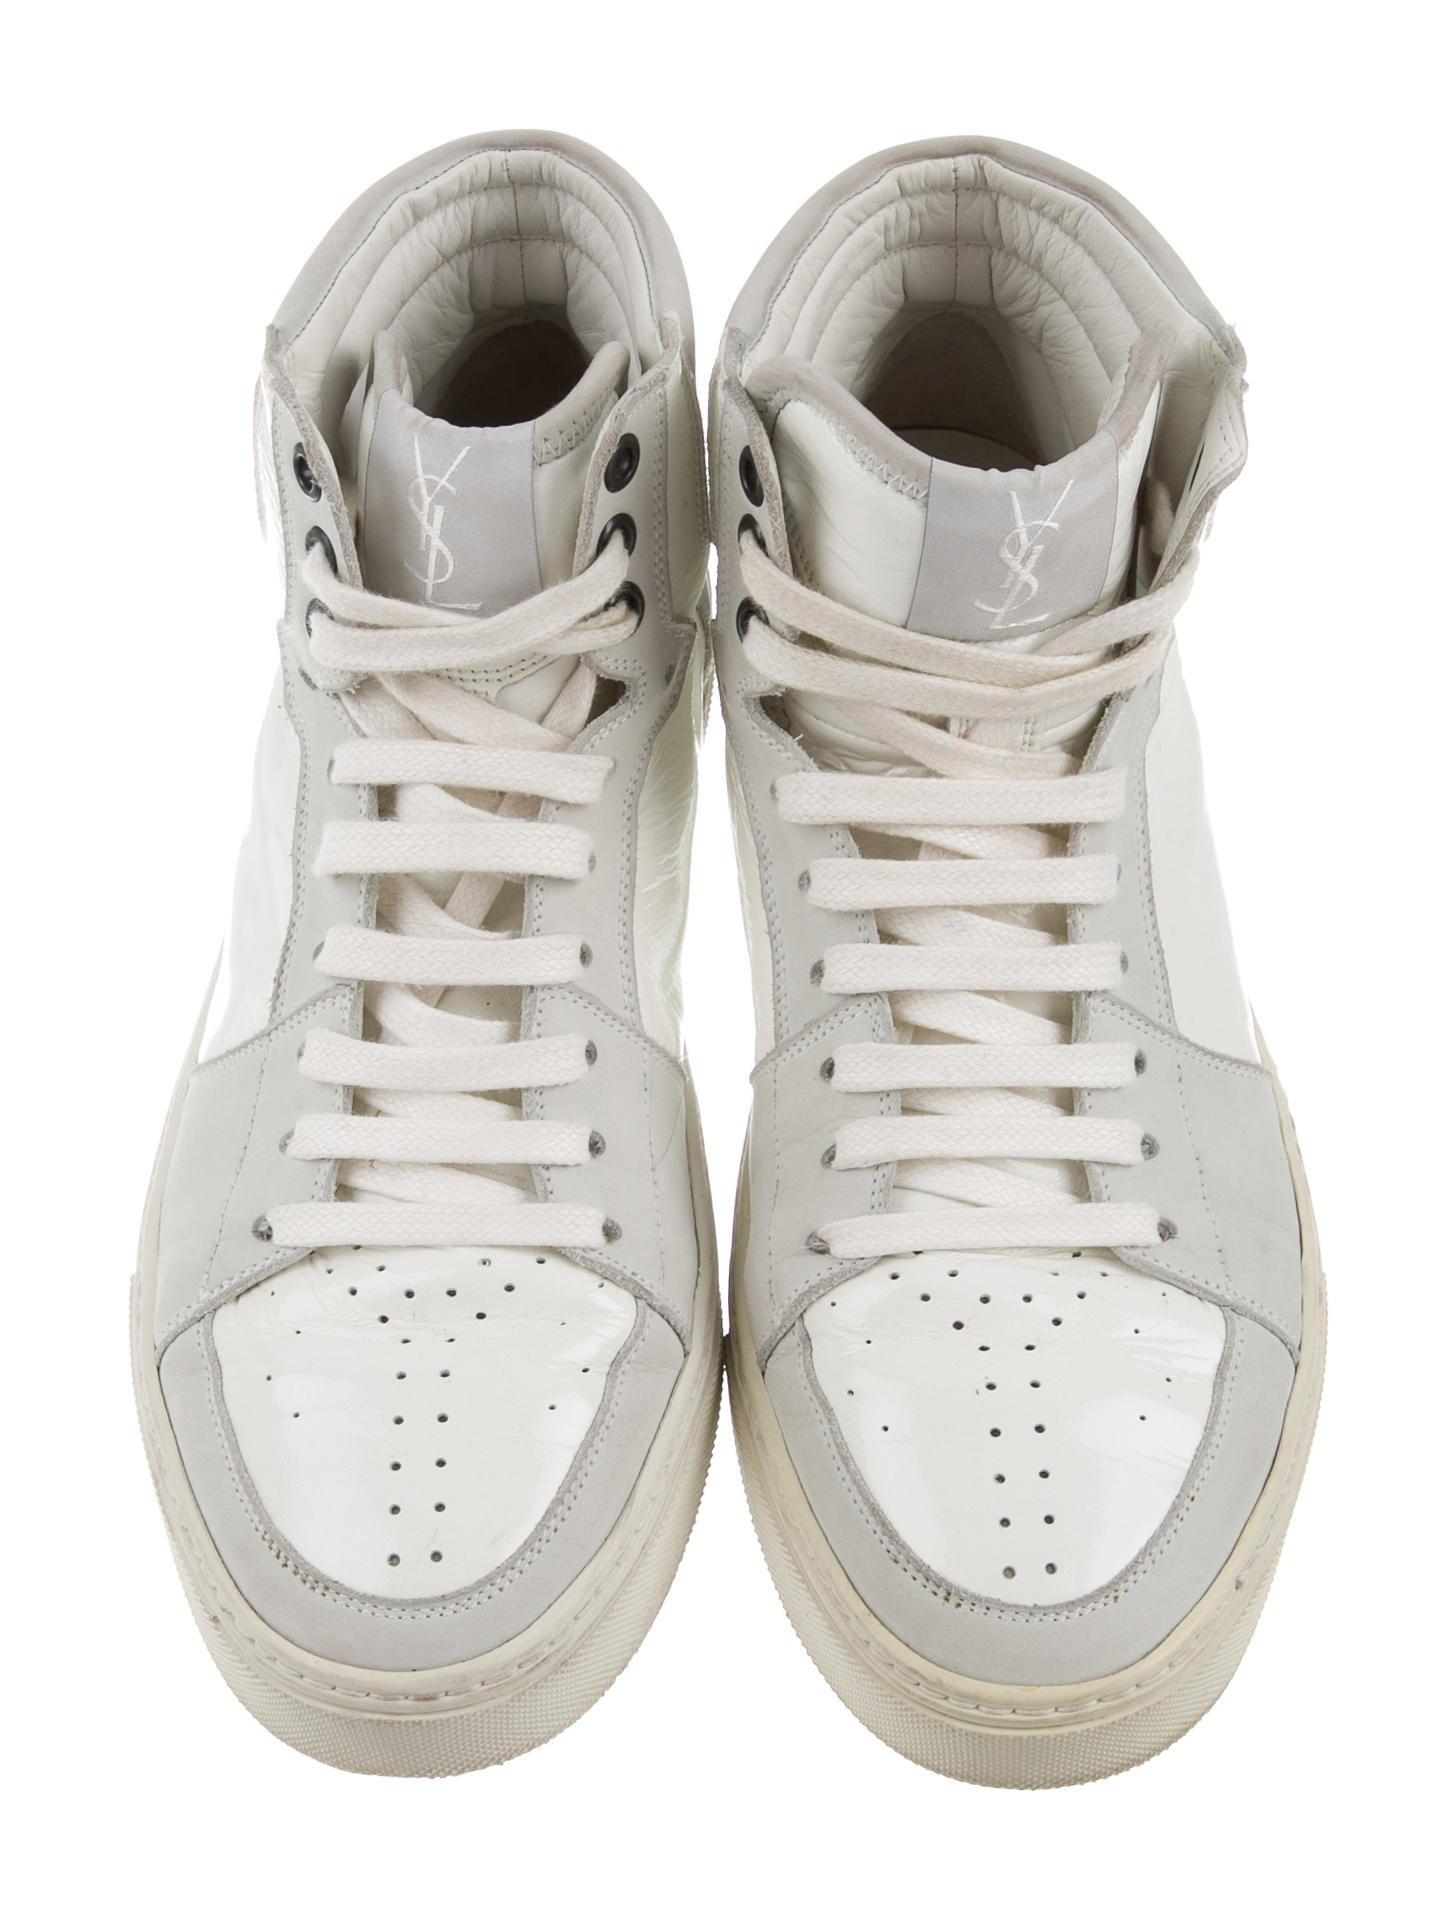 d3e922bcd64 YSL Malibu Hightop Sneaker in Black Patent Leather Sneakers